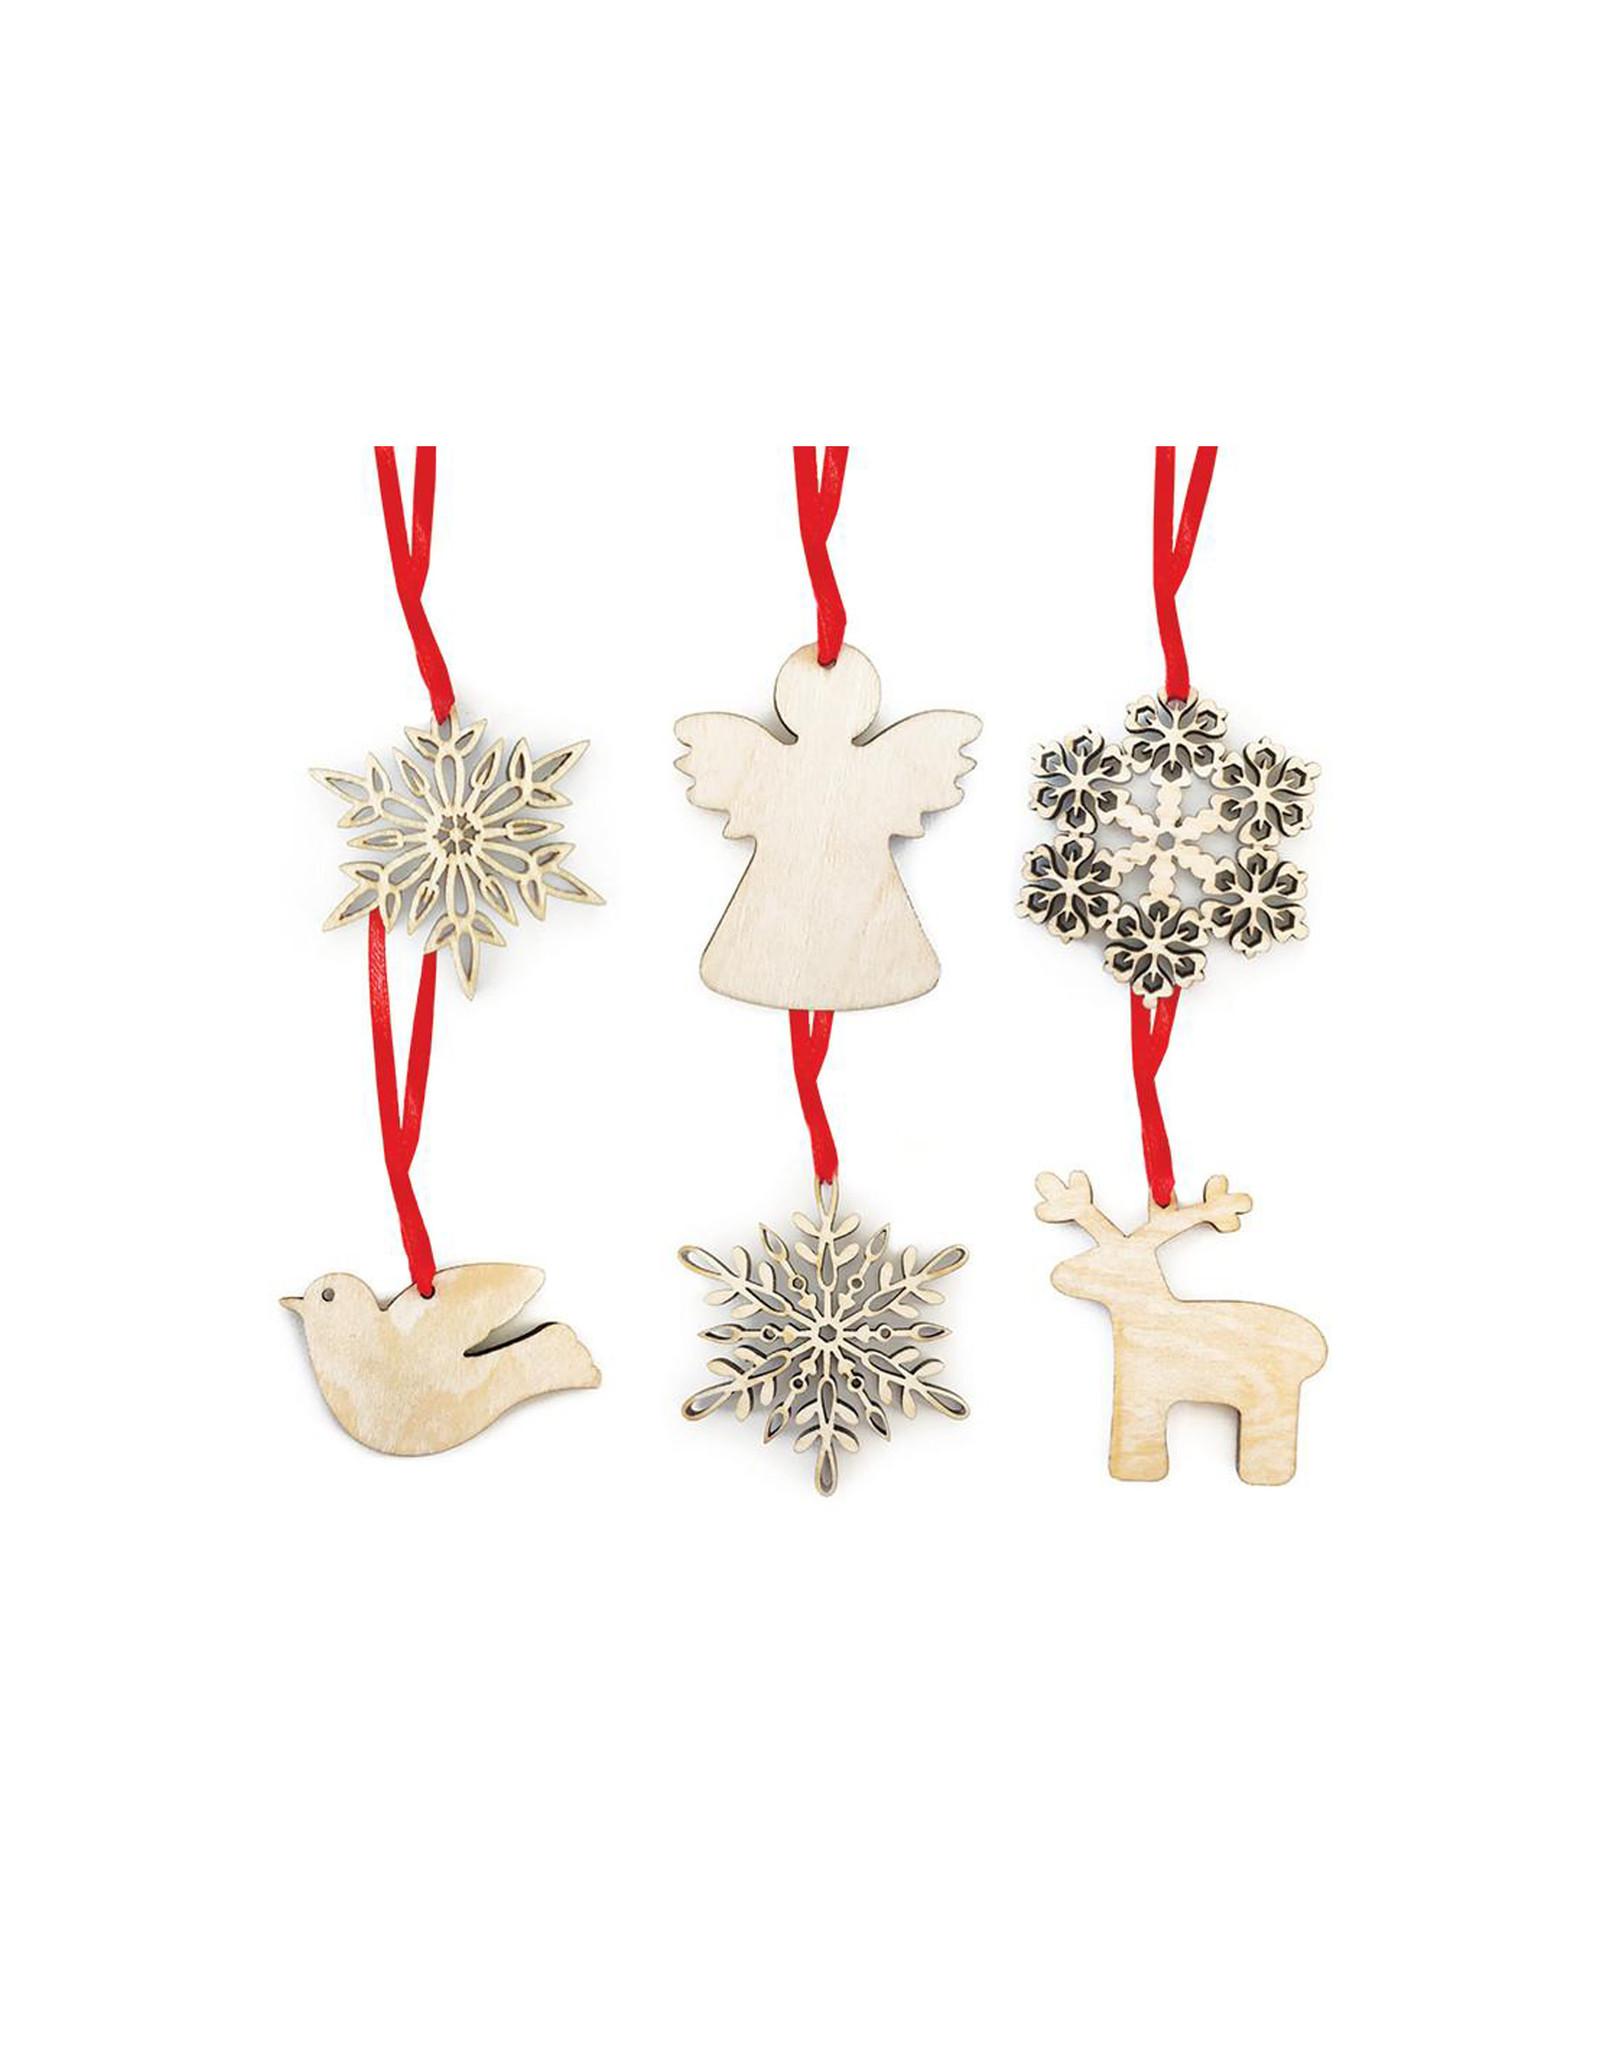 Teroforma Bottle Neck Mini, Nice, Holiday Ornaments